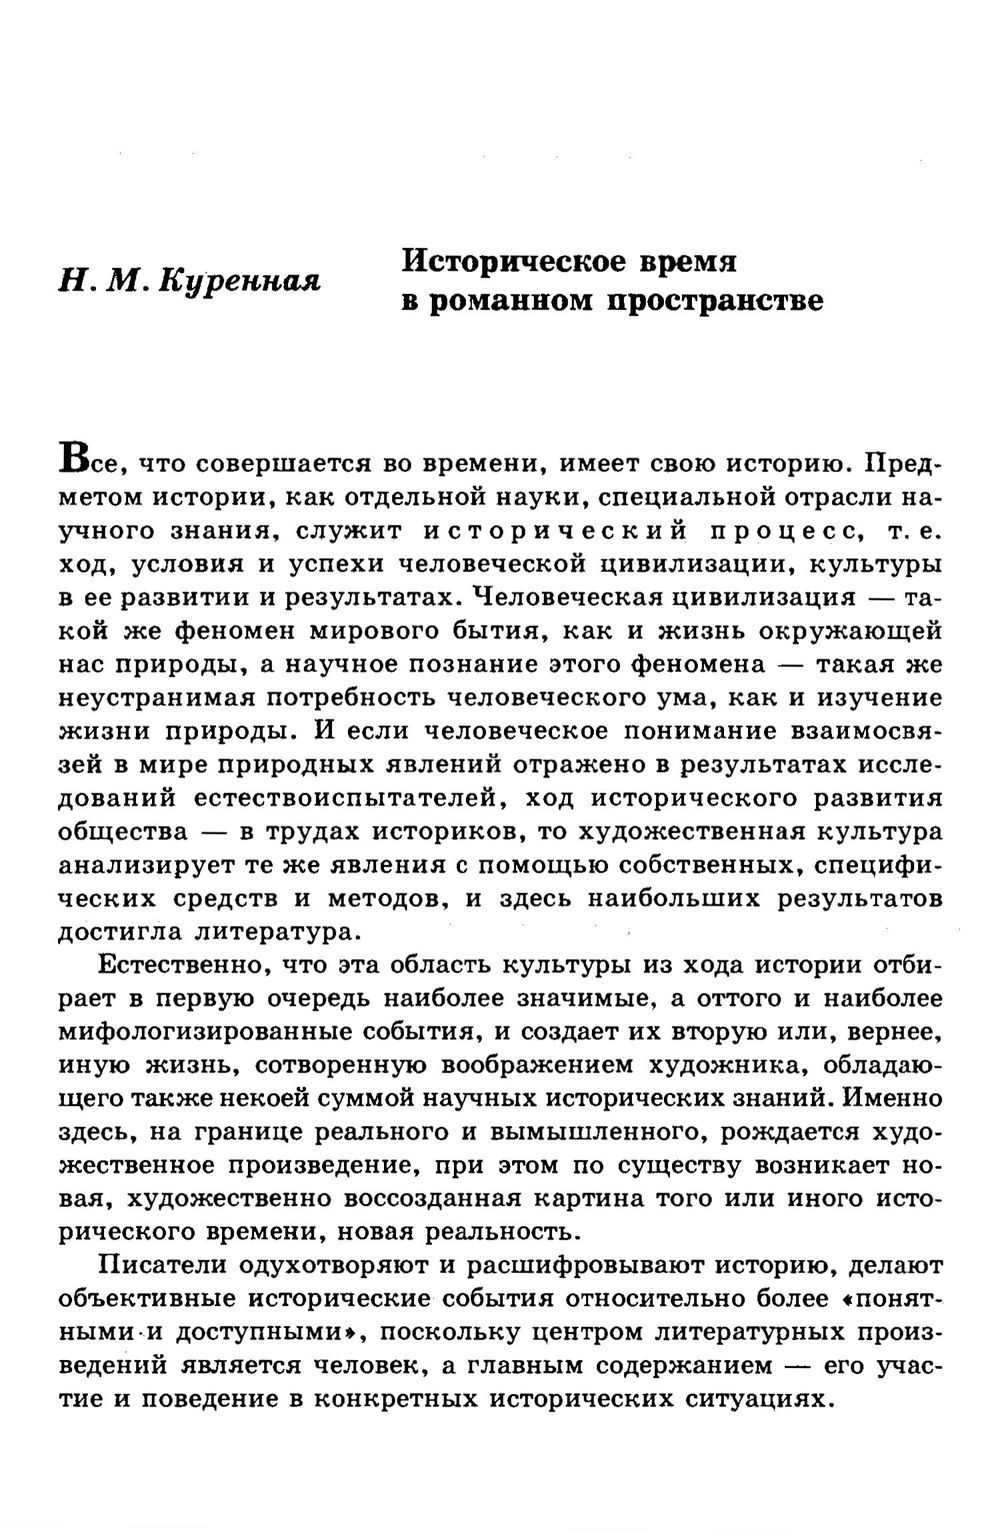 http://i1.imageban.ru/out/2017/01/11/ebbfed396c8a8e40be045b693a56cc57.jpg